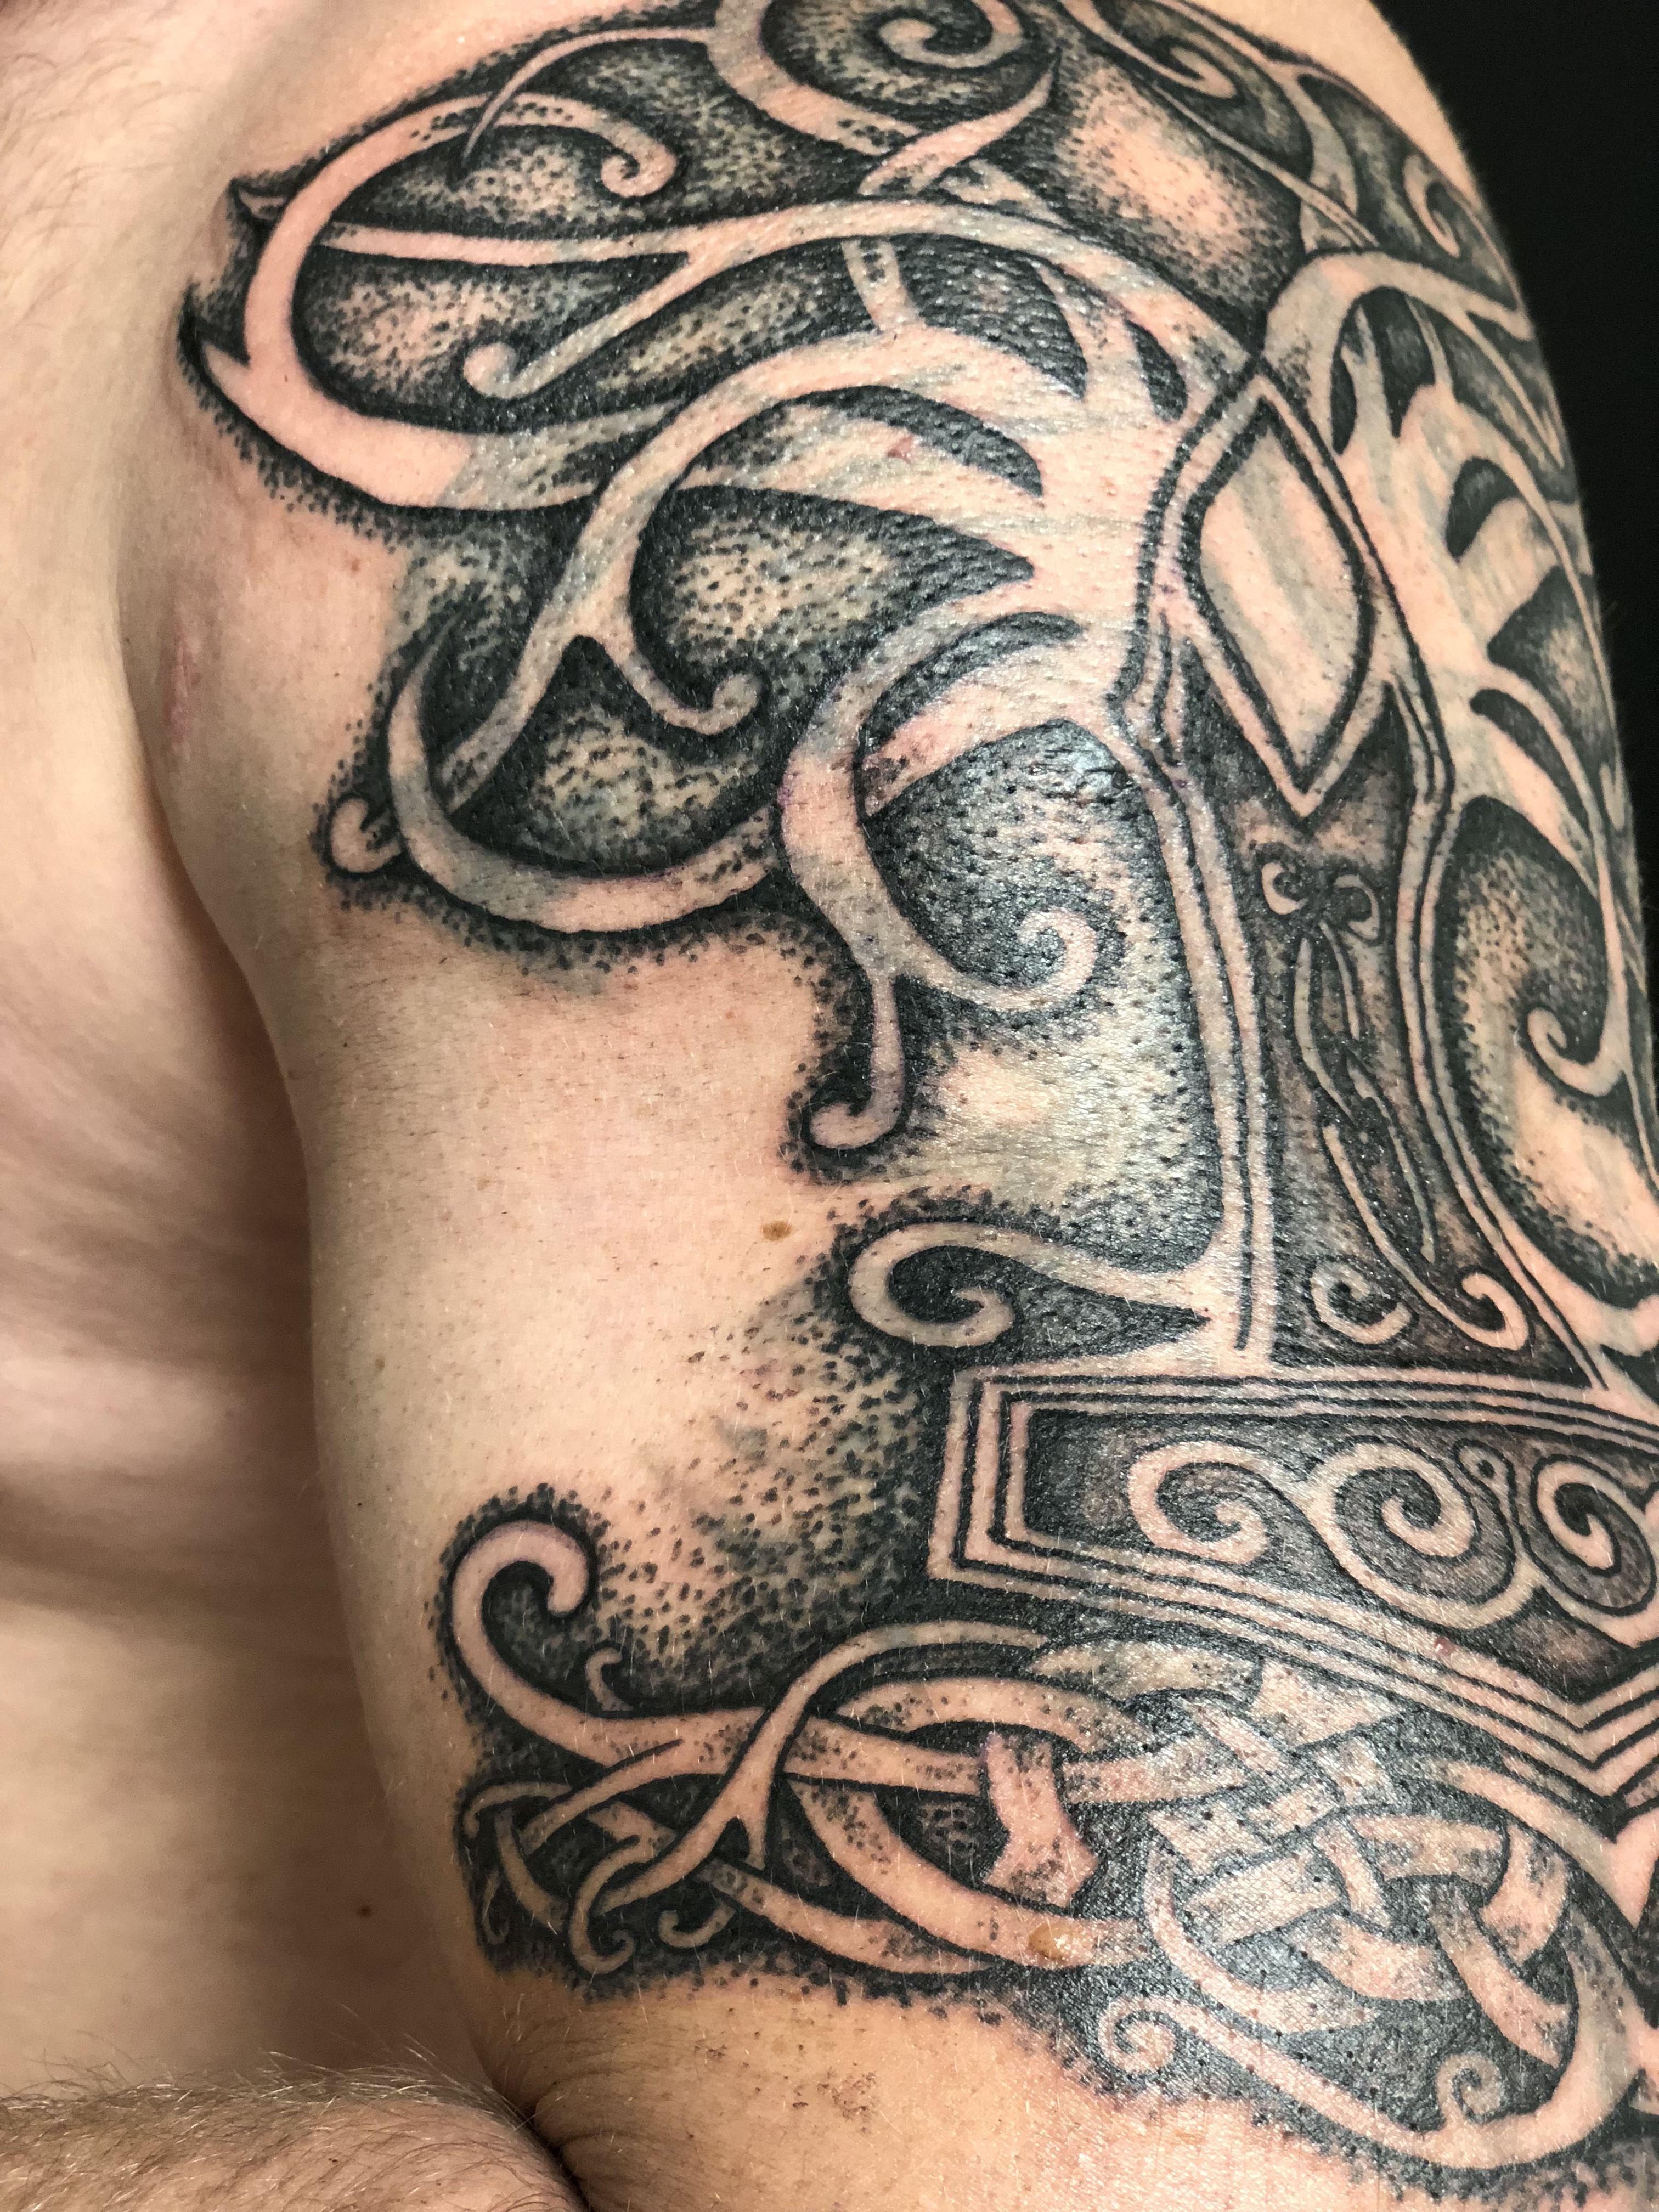 Yggdrasil Mjolnir Tattoo Arttatoo Mjolnir Yggdrasil Norse